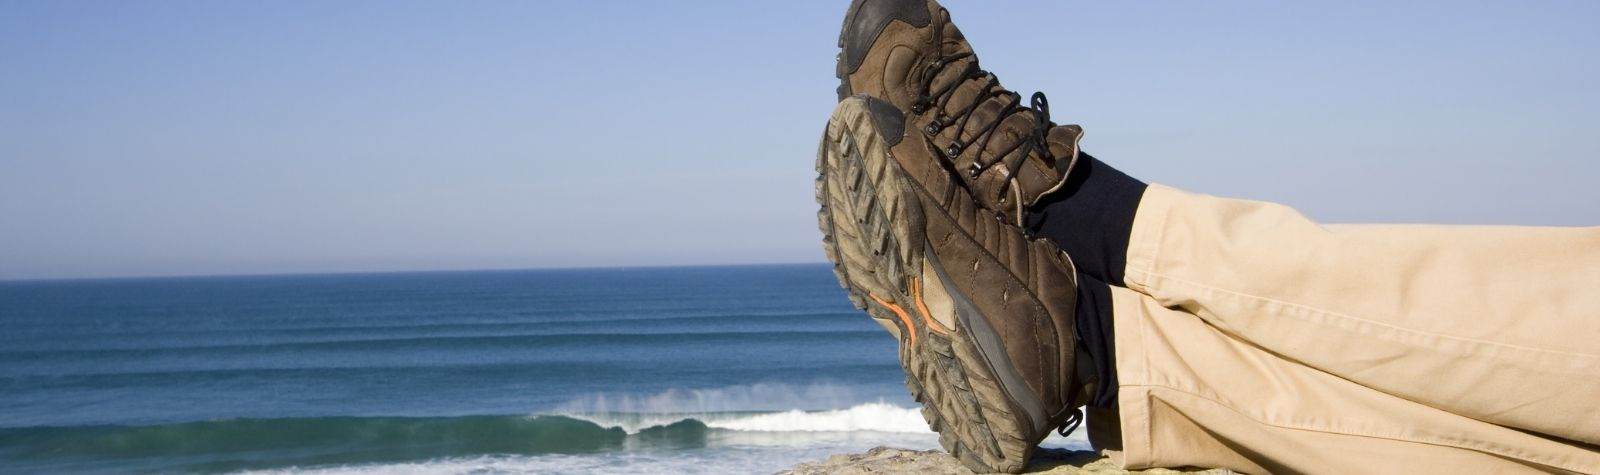 Evolve | Kick your feet up